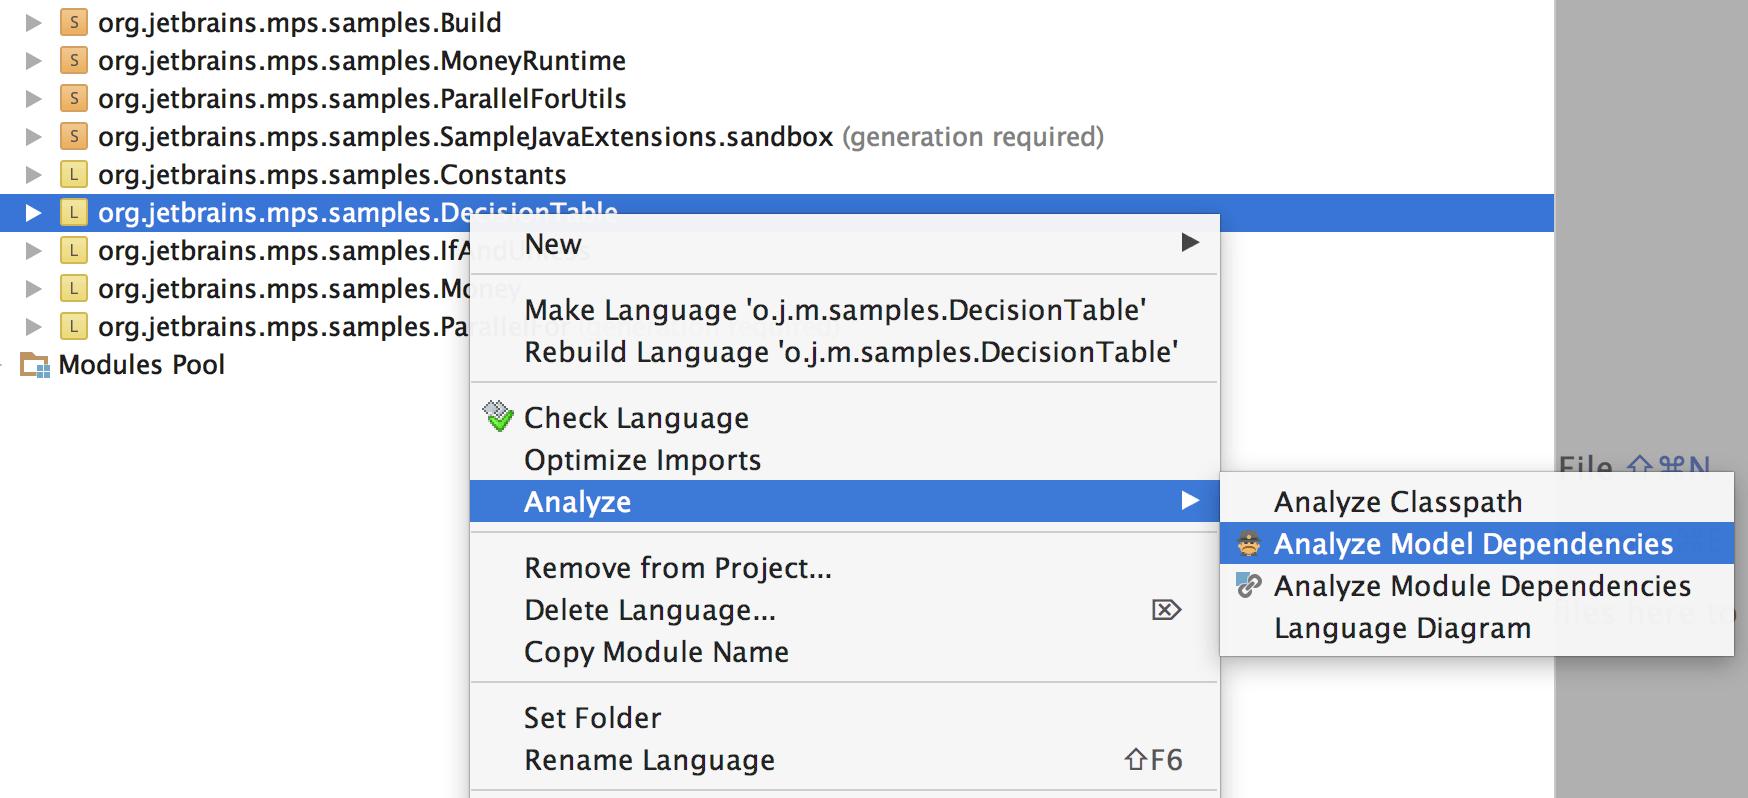 Dependencies Analyzer from context menu